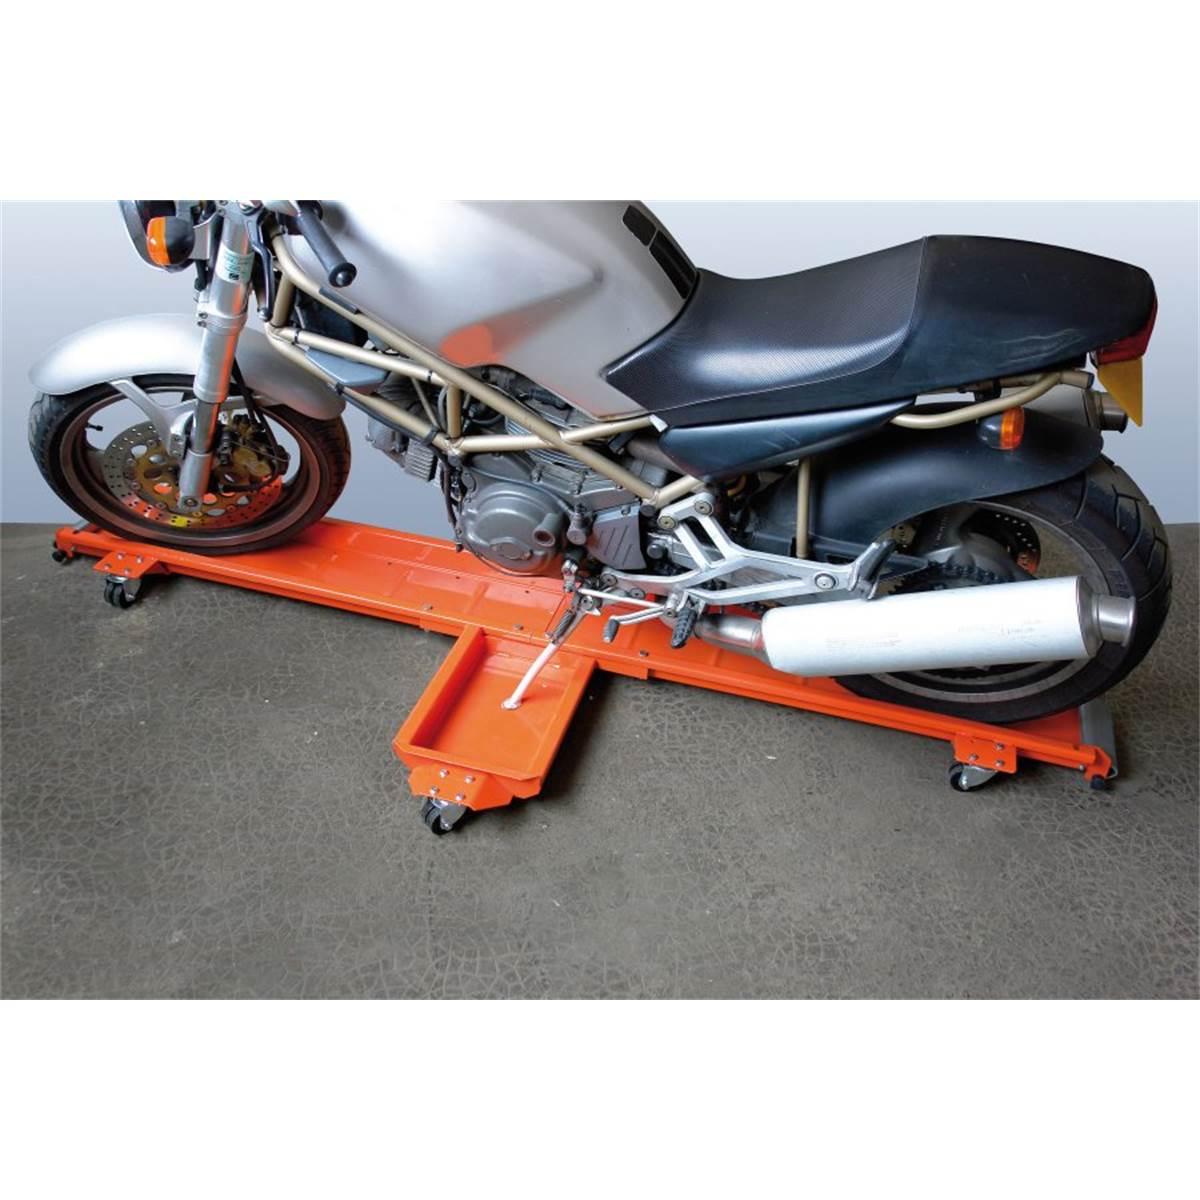 Range Moto Bike & Racks - Feu Vert à Range Moto Norauto